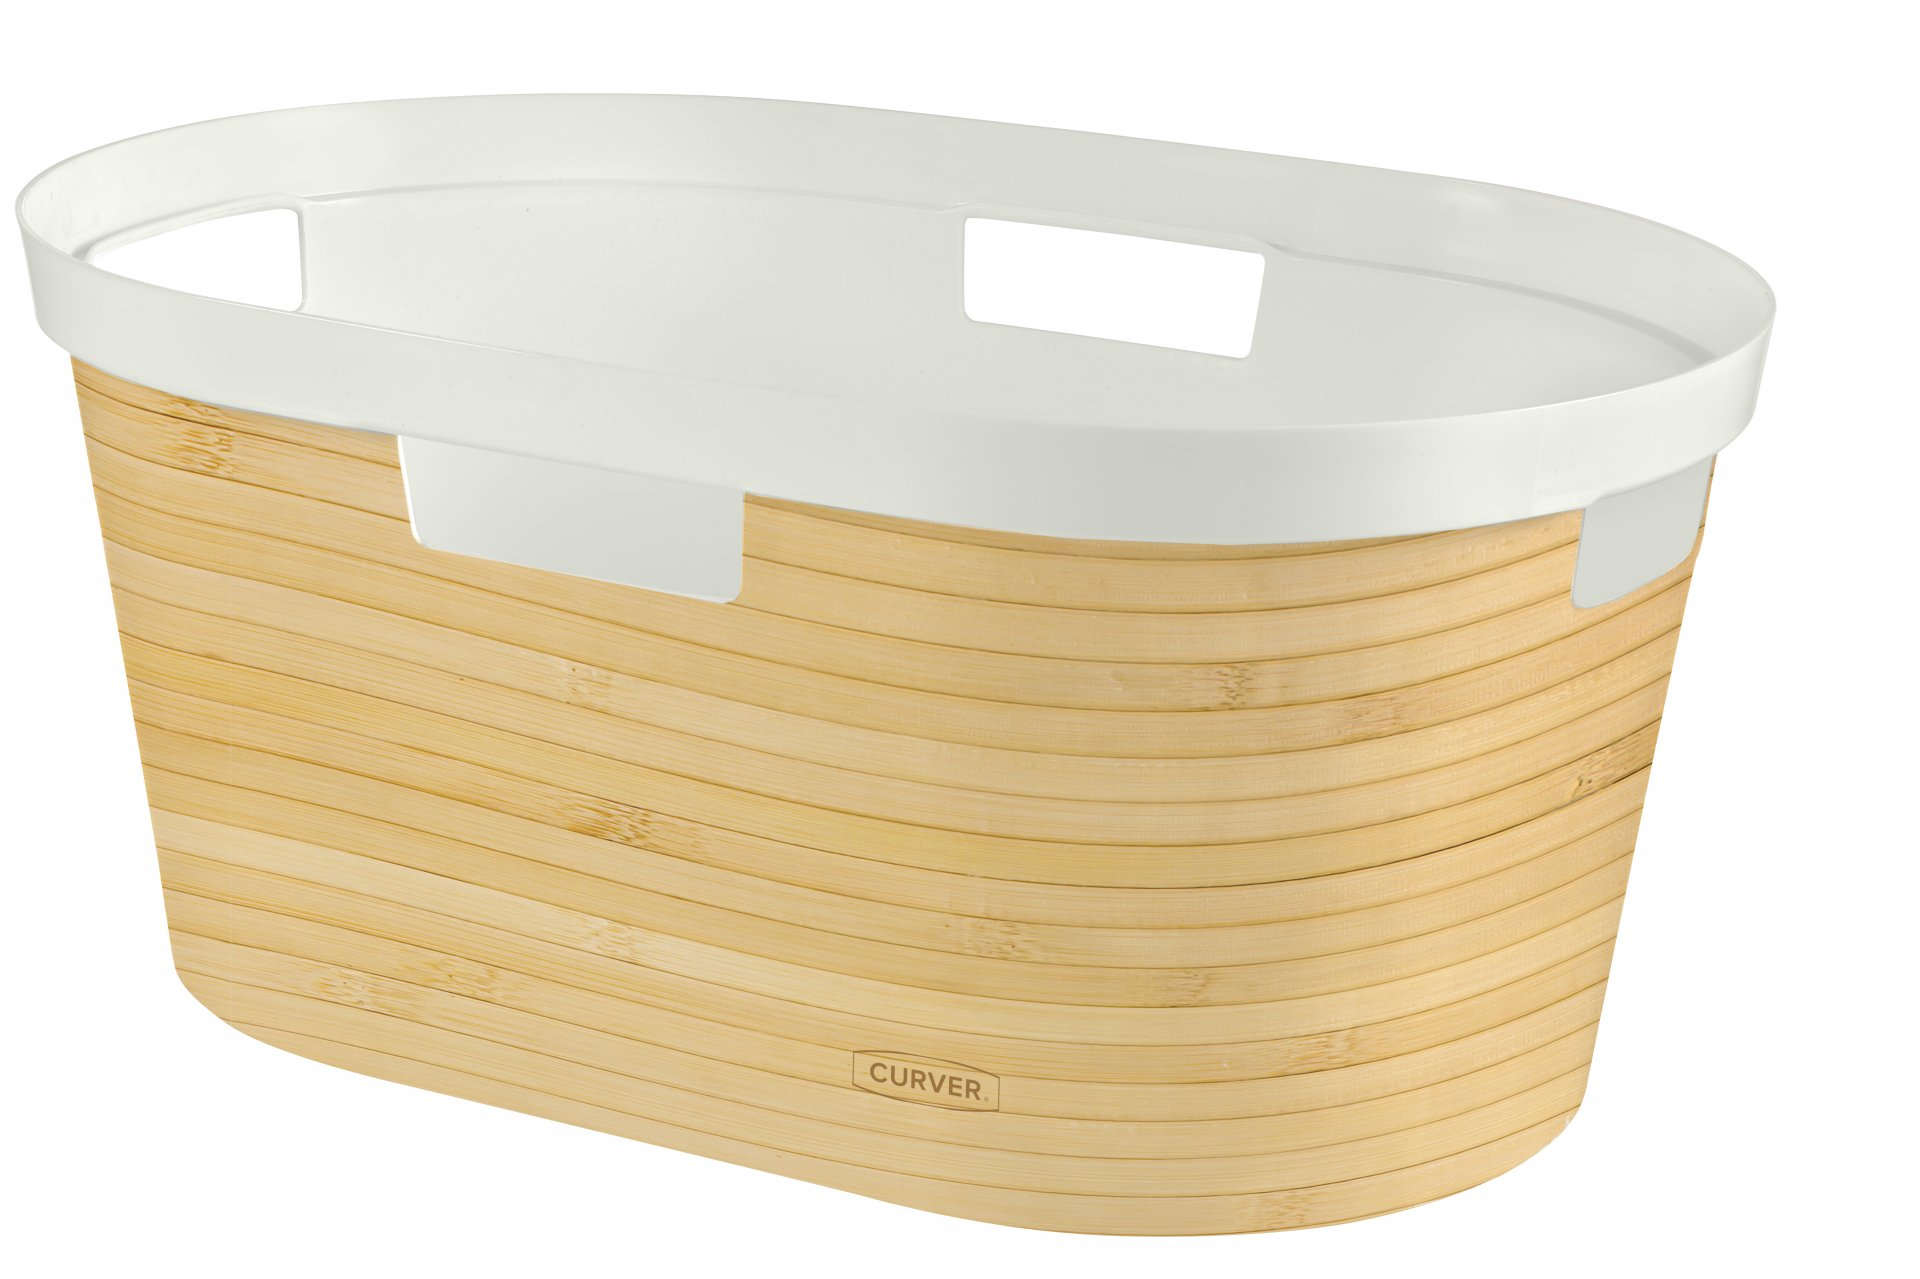 Curver Koš na čisté prádlo INFINITY 39L vzor bambus